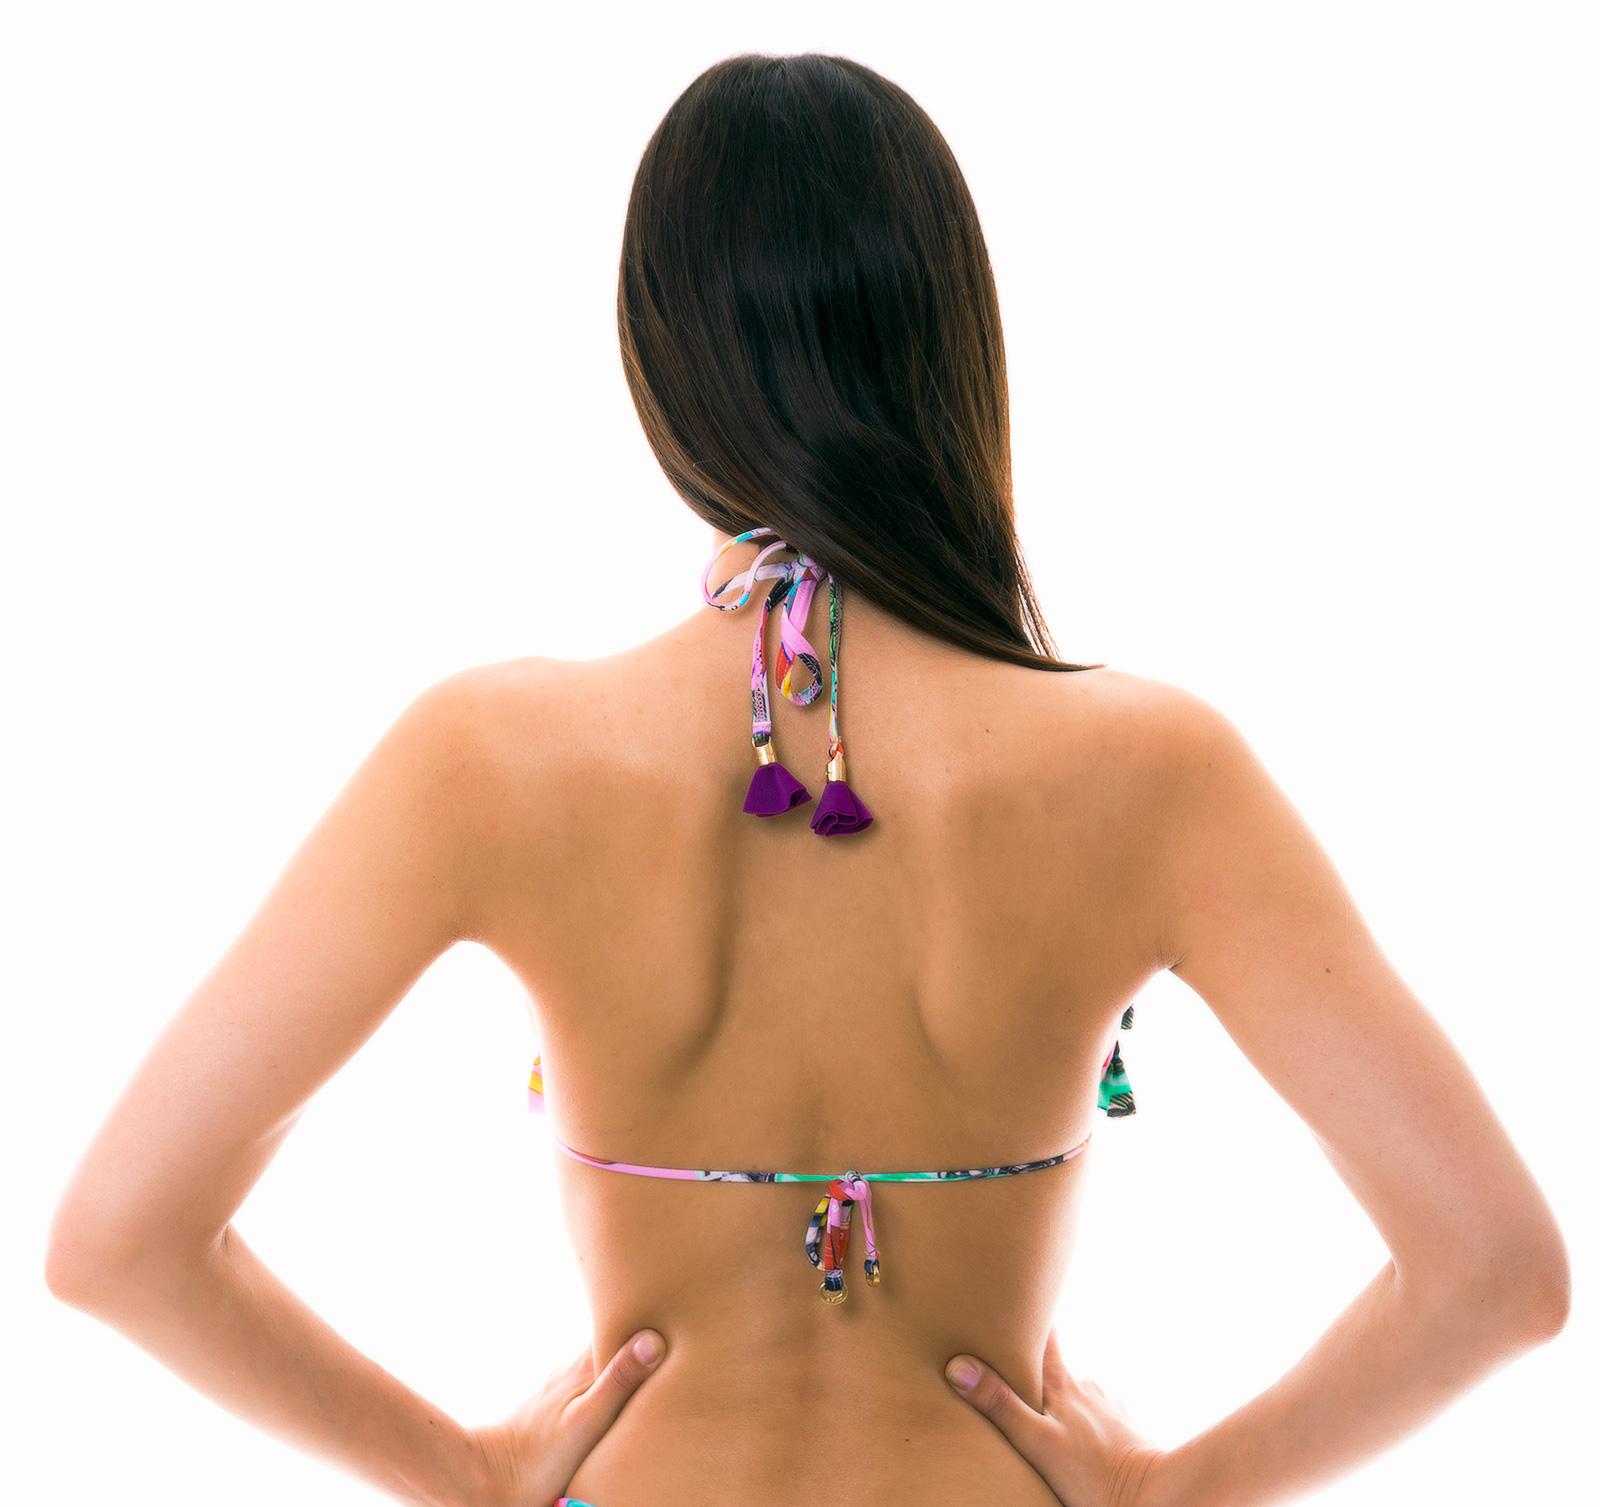 85e6370ae392 Sujetador Triangular De Bikini Con Holanes Y Estampado Cubano - Top  Bora-bora